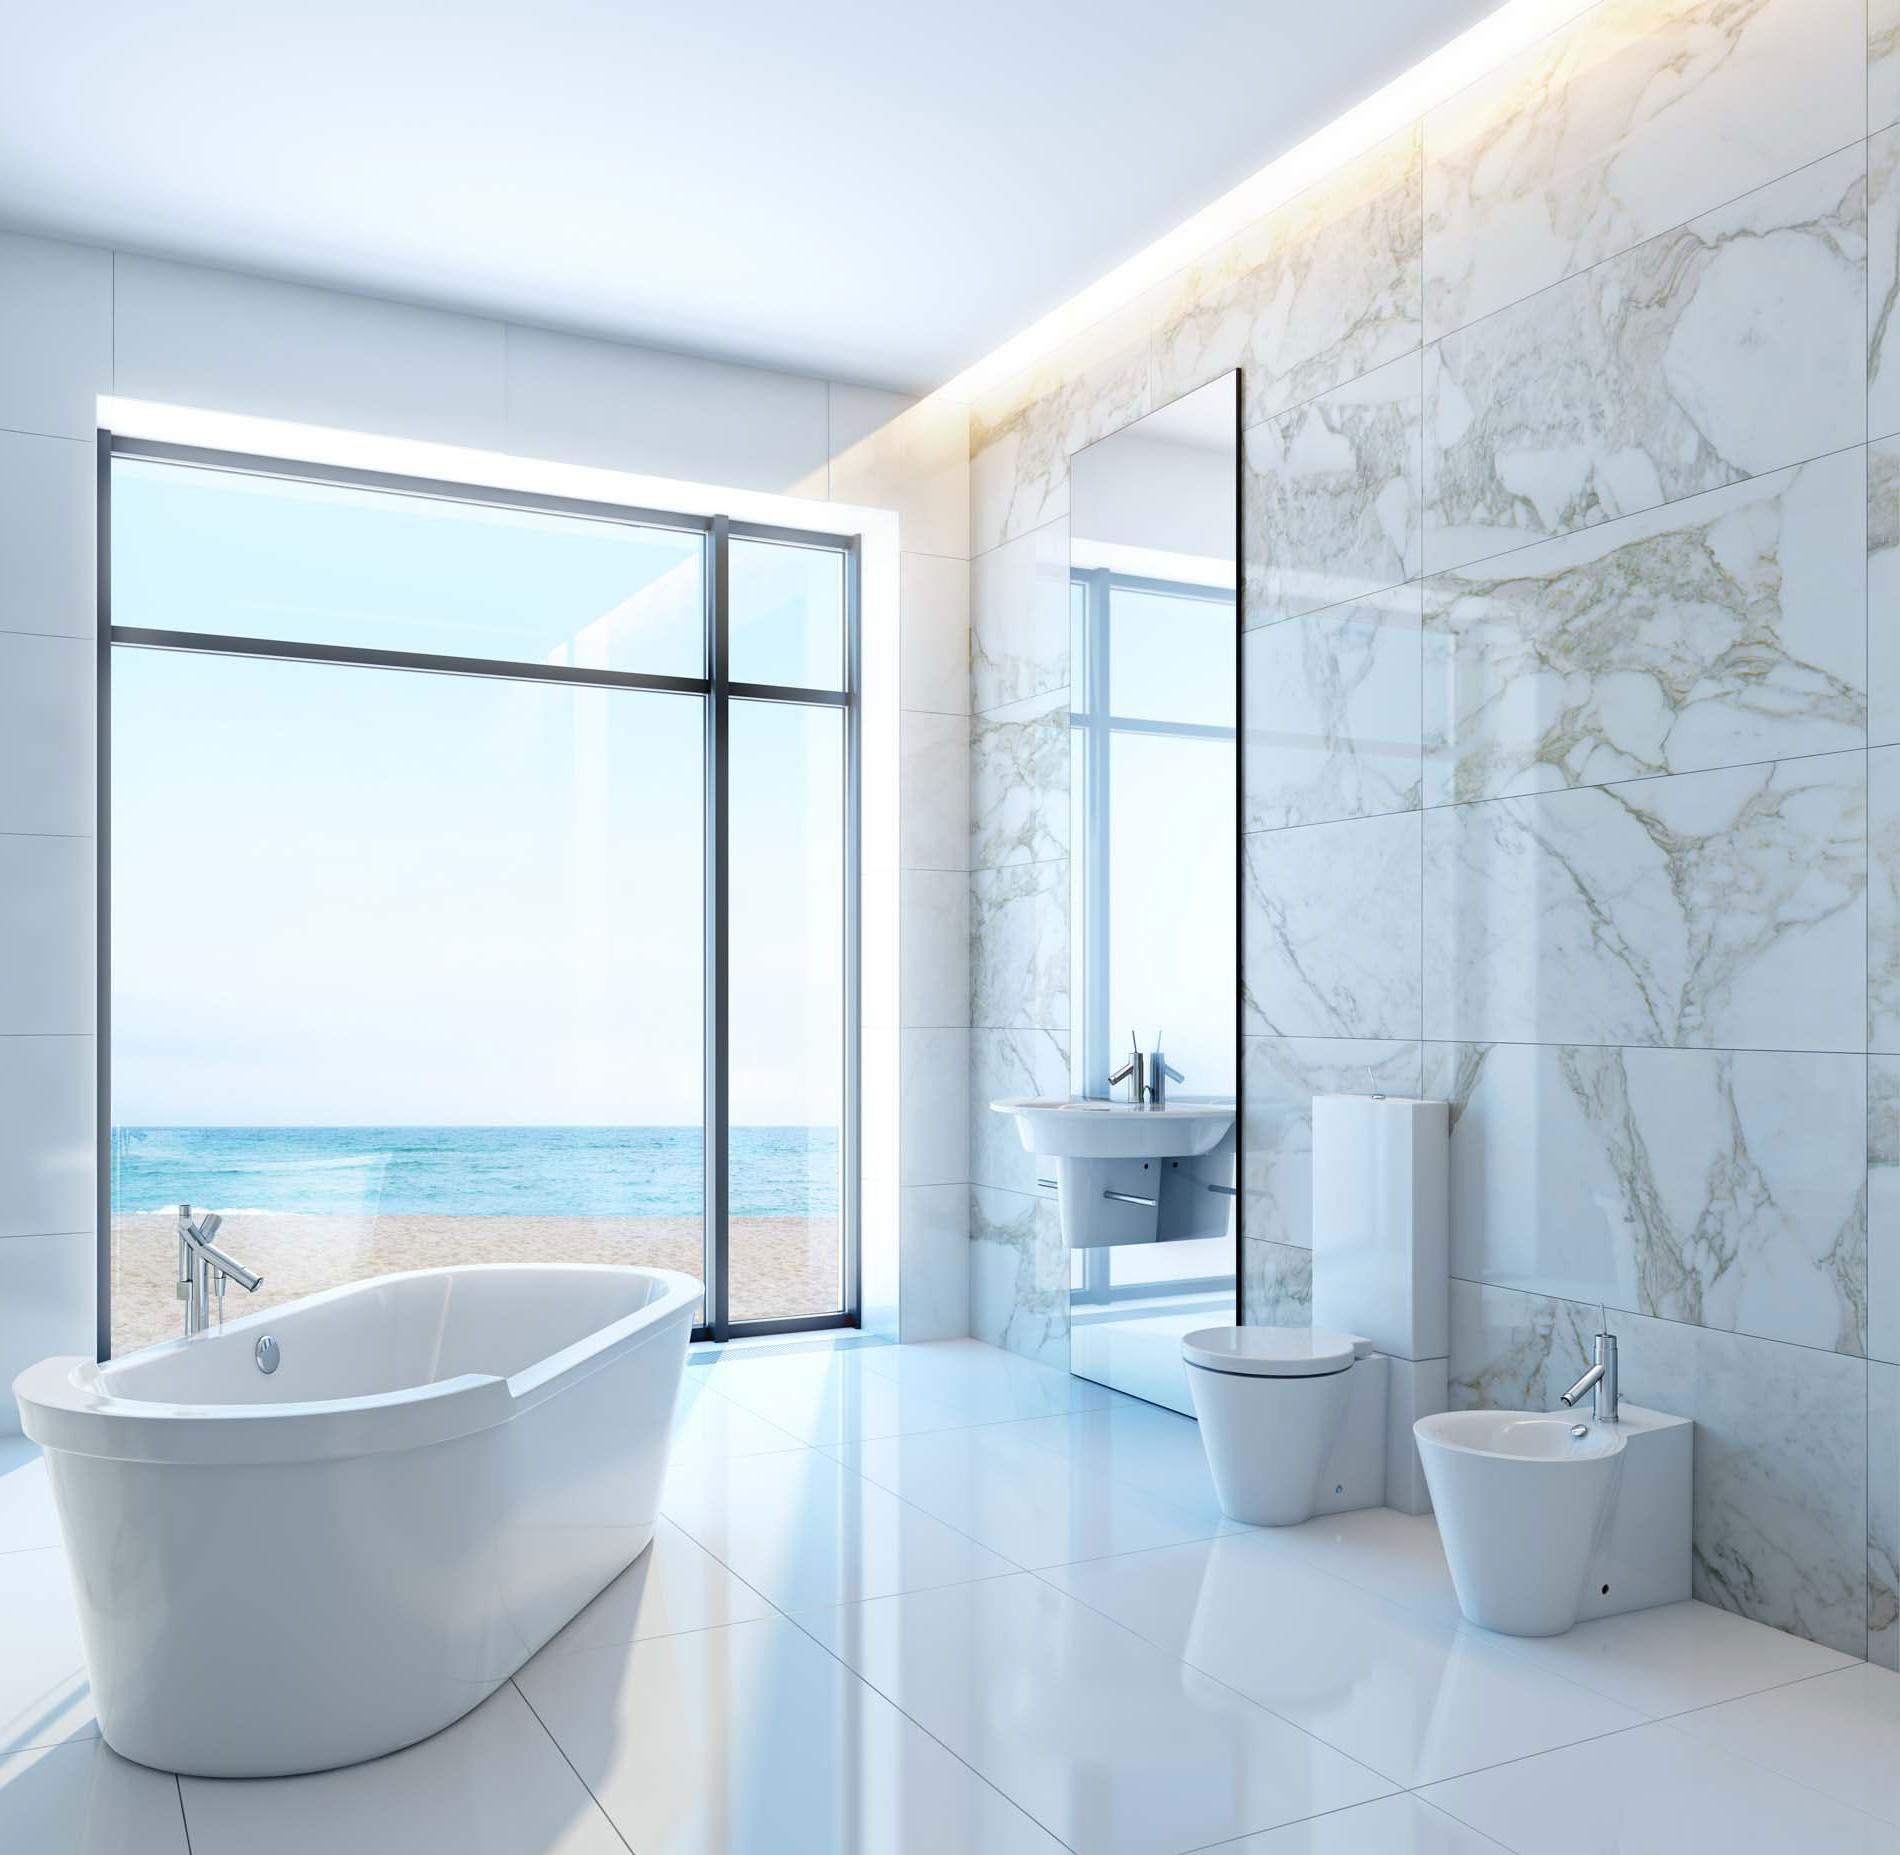 Salle de bain clef en main